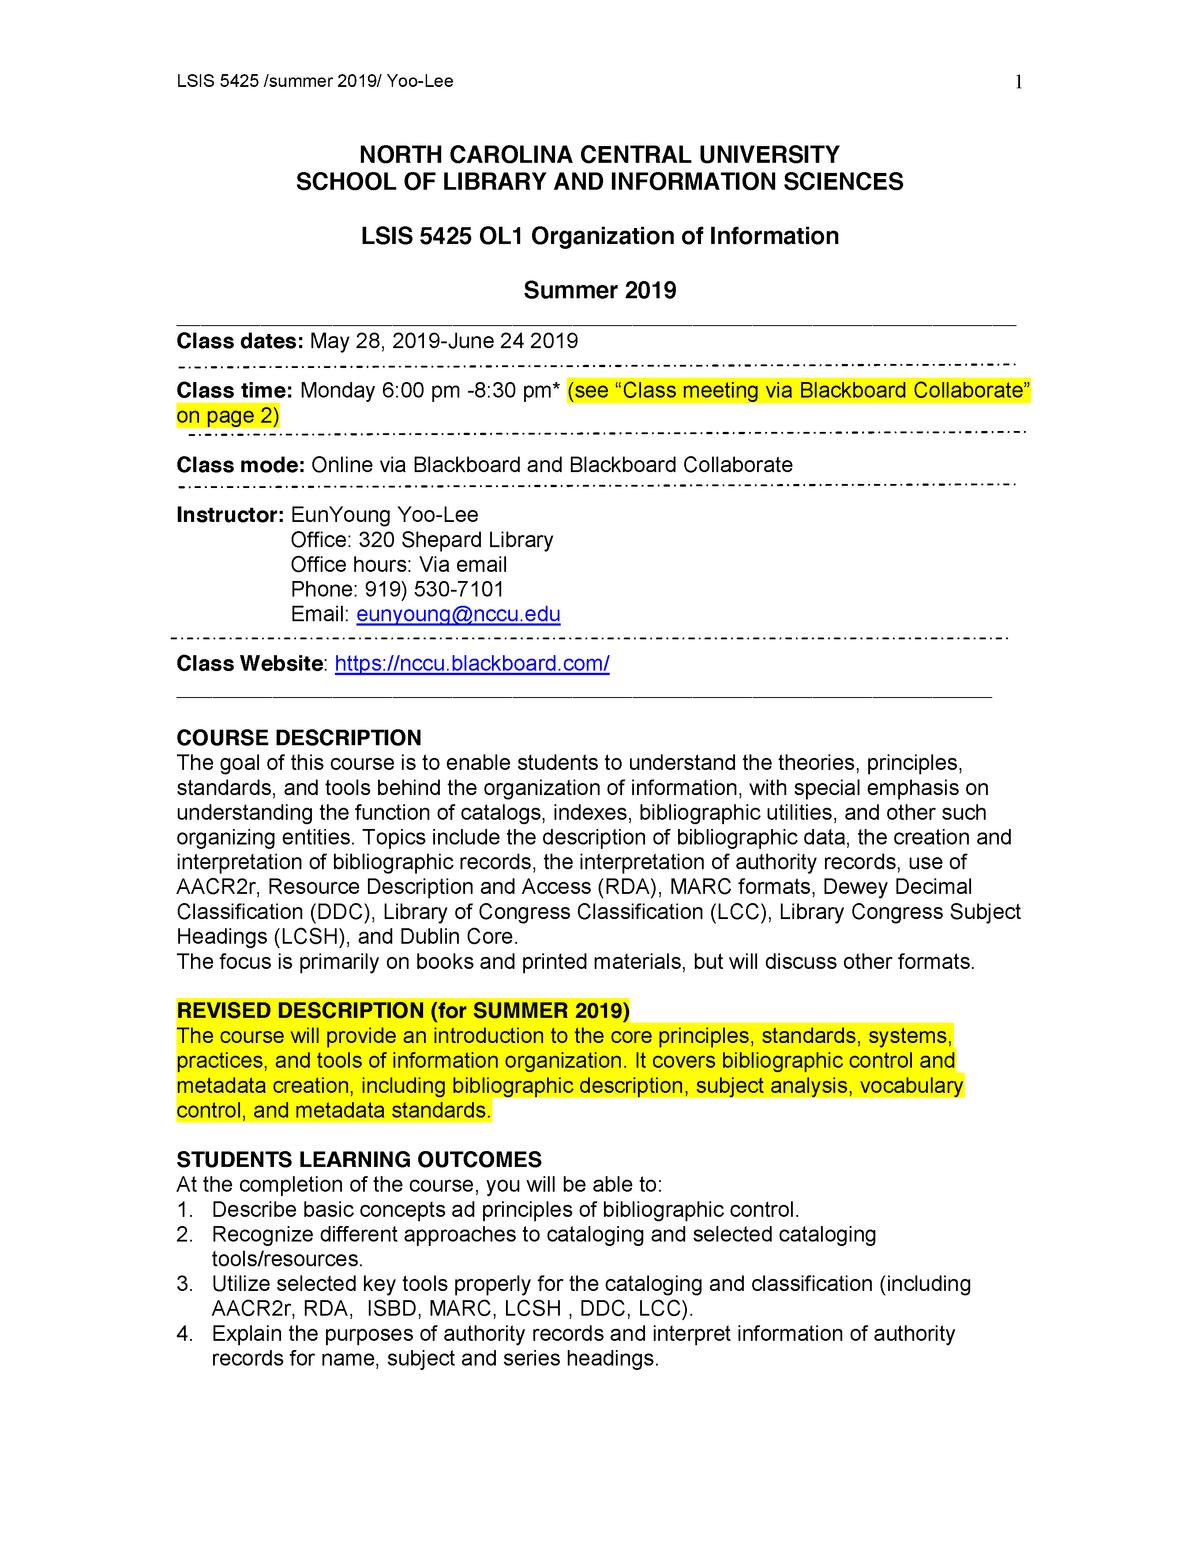 LSIS 5423 Syllabus Organization of Information Summer 2019 - LSIS